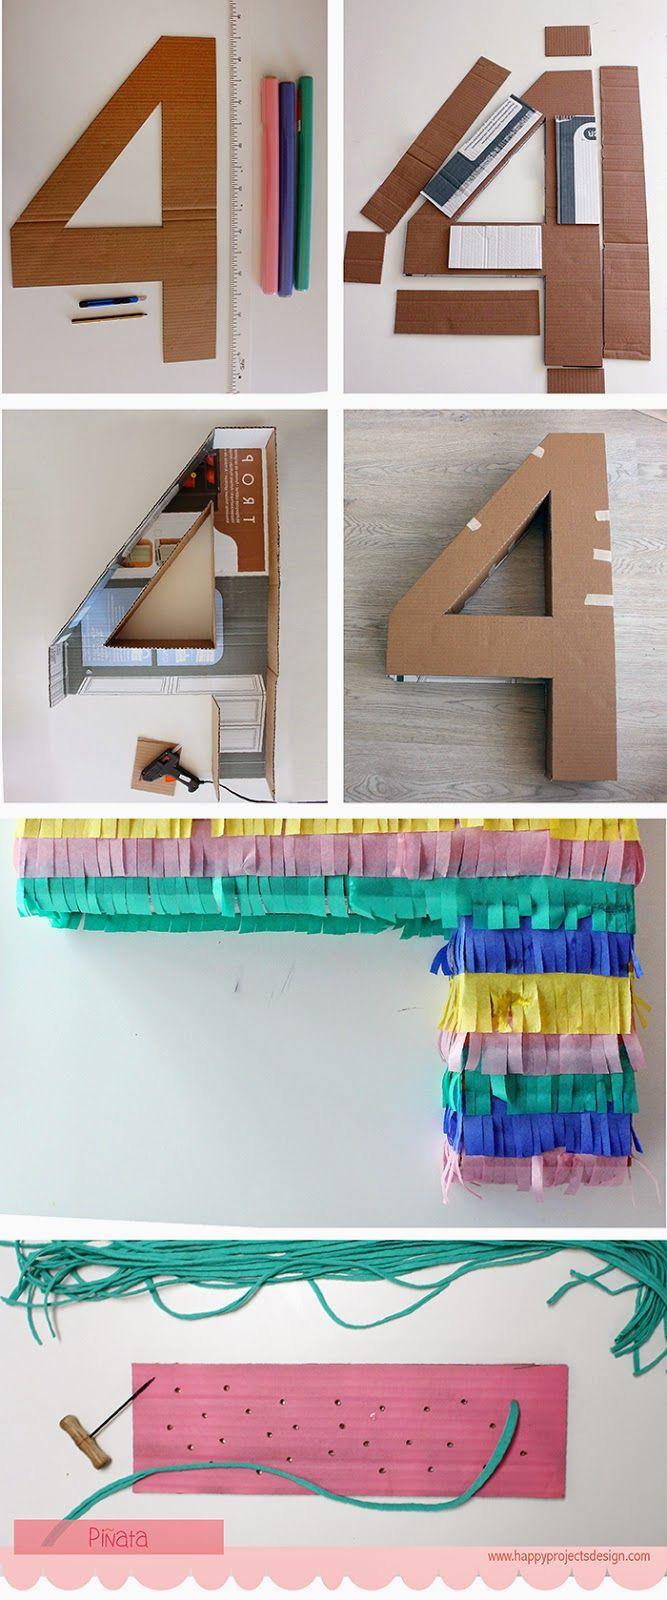 happyprojectsdesign: Carla Cumple 4